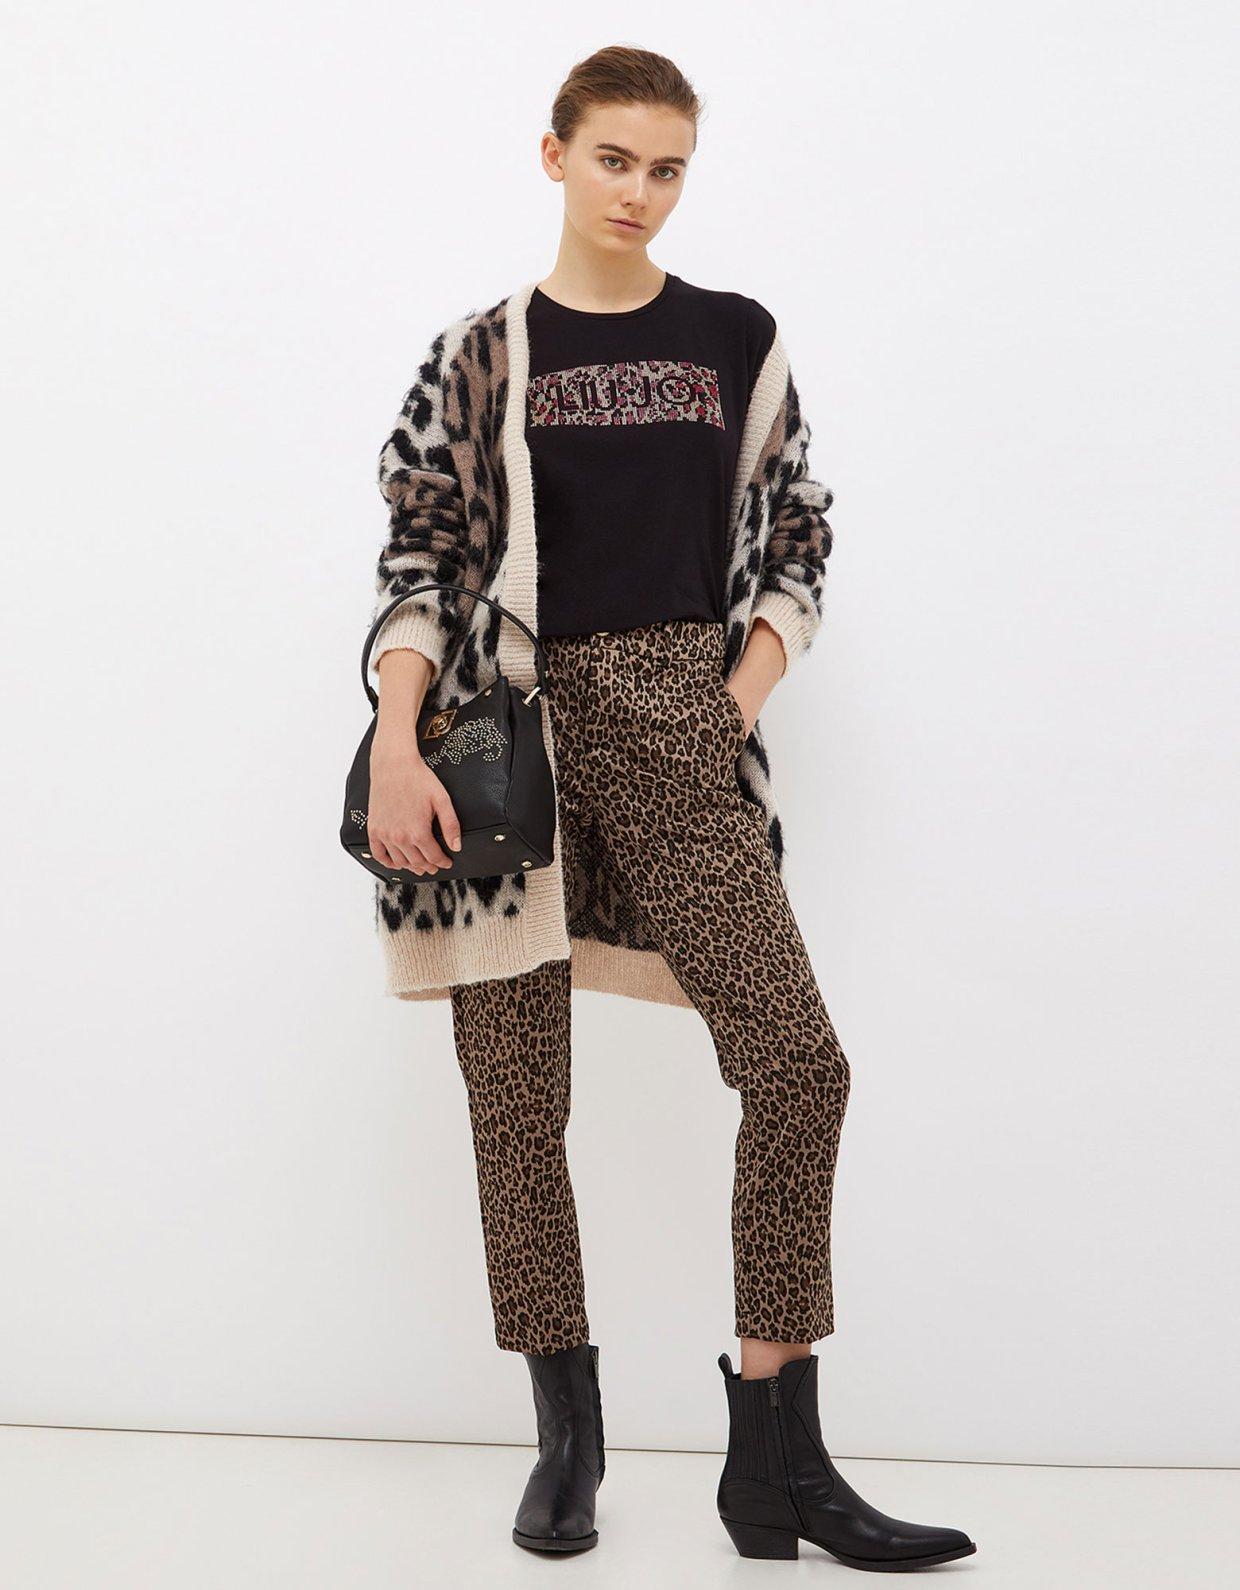 Liu Jo T-shirt with logo and appliqués black leopard